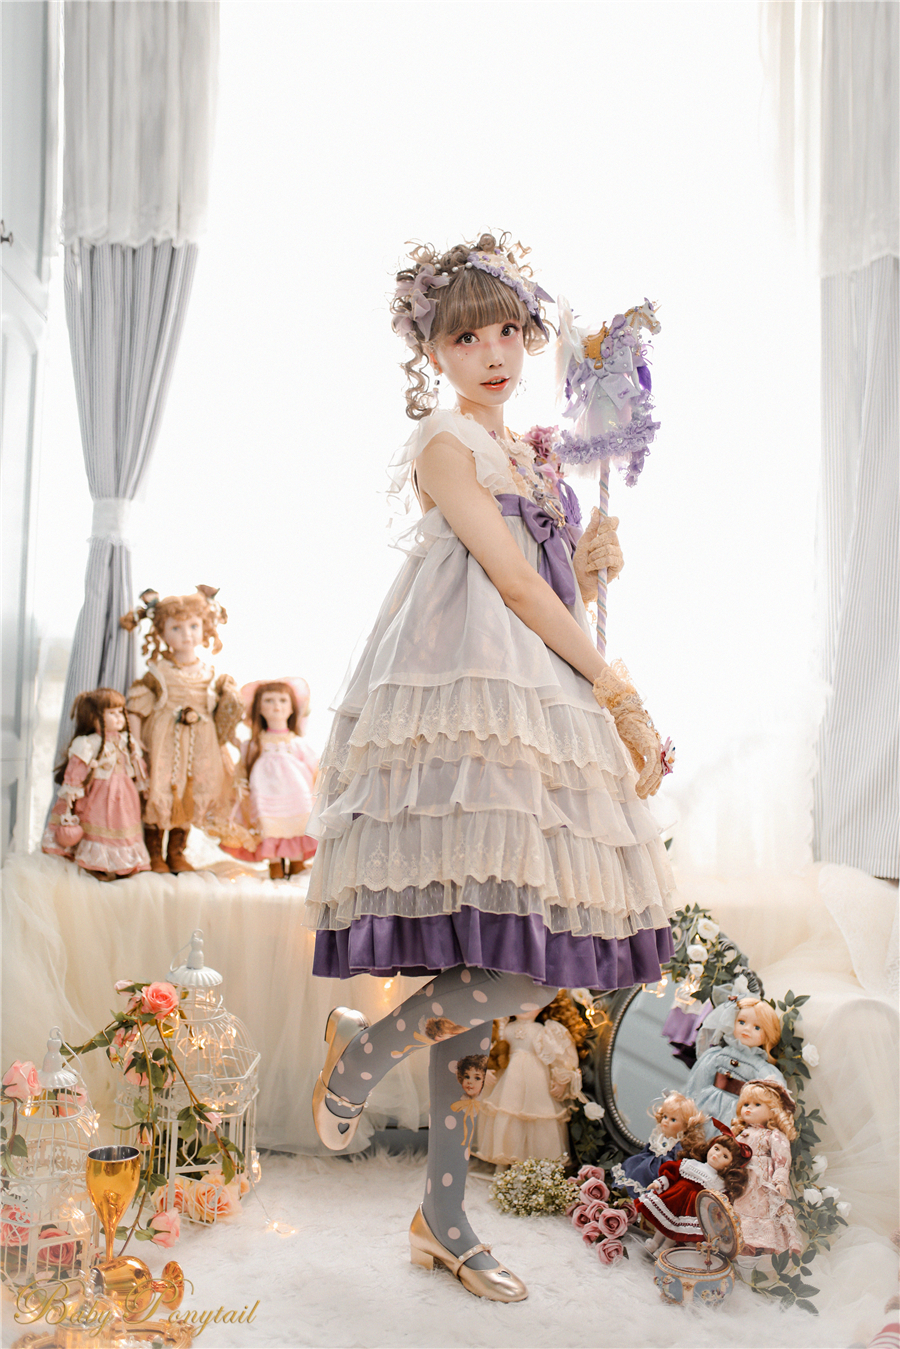 Babyponytail_Model Photo_Present Angel_JSK Violet_2_Kaka_02.jpg